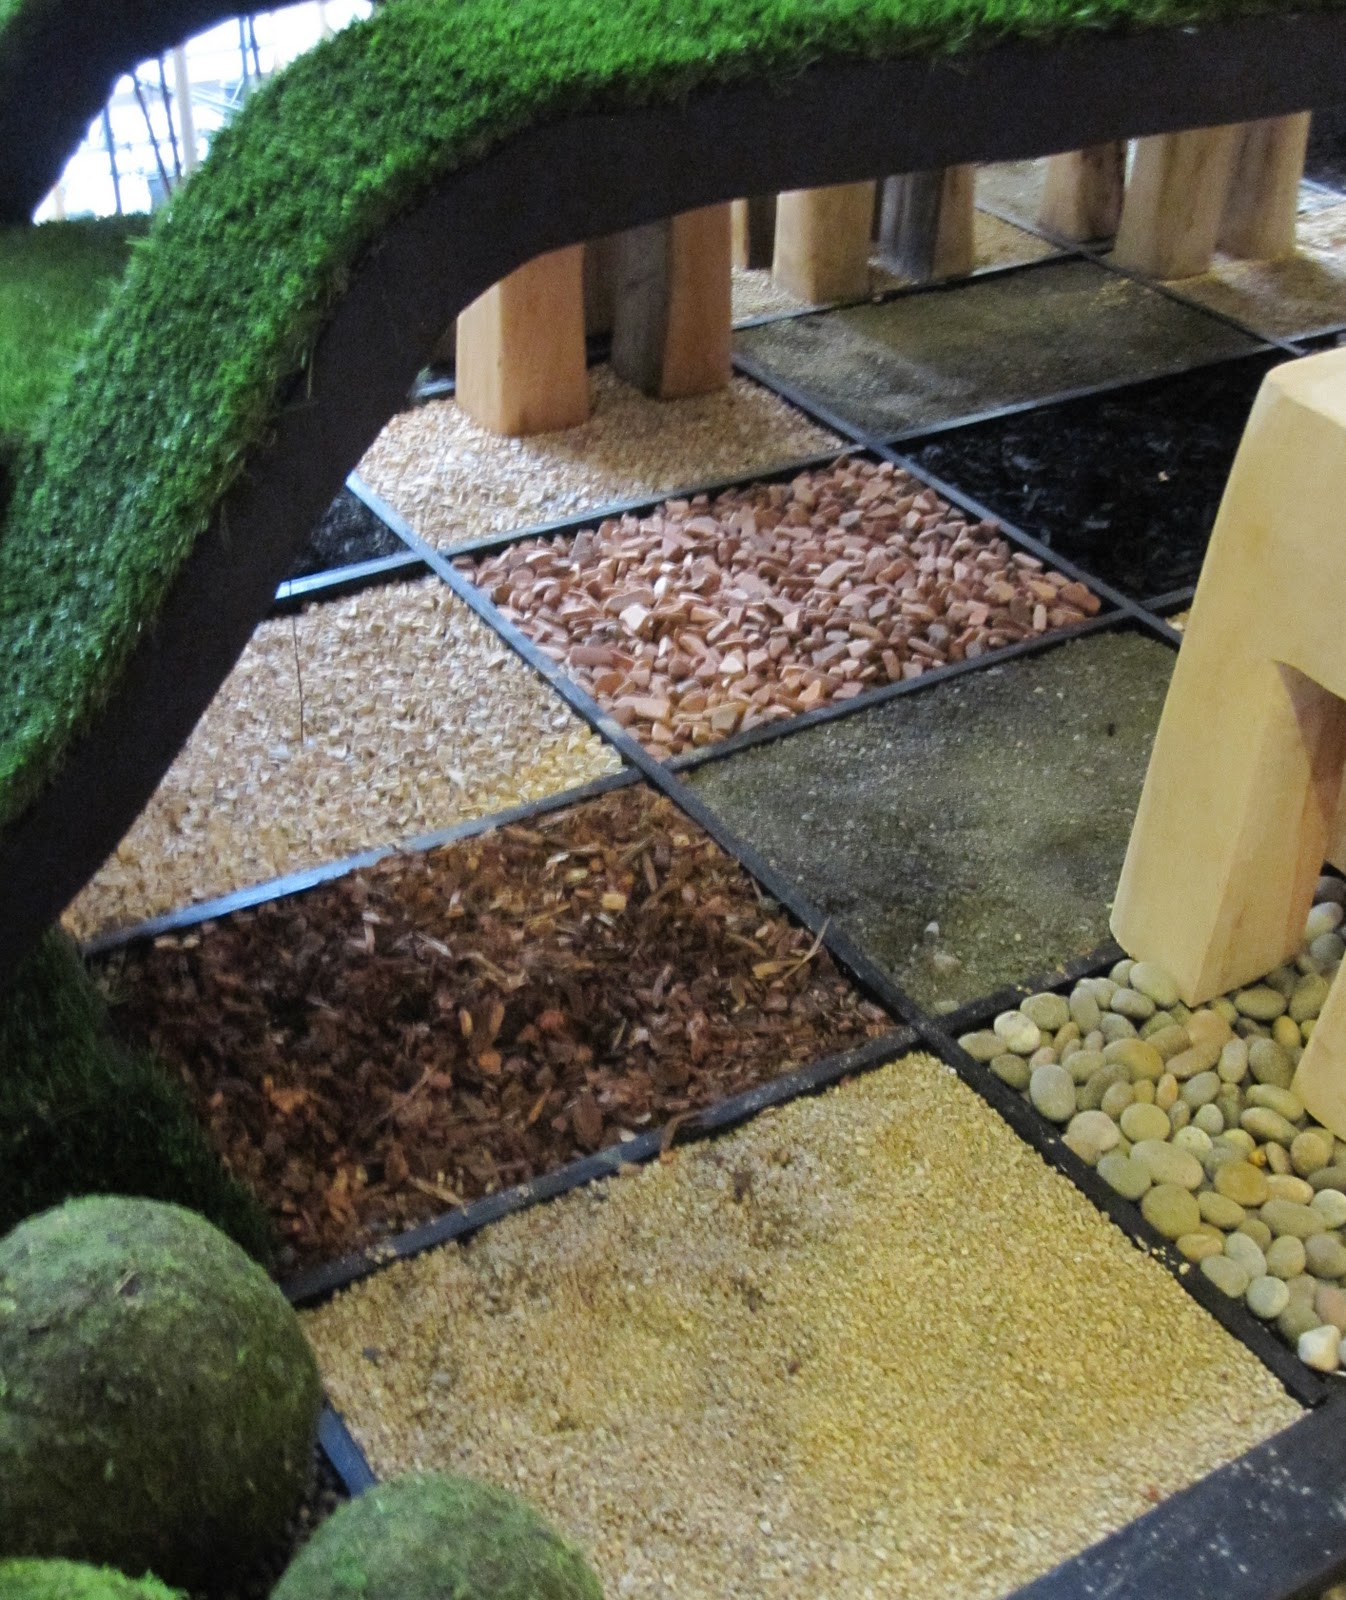 Design squared details details for Checkerboard garden designs